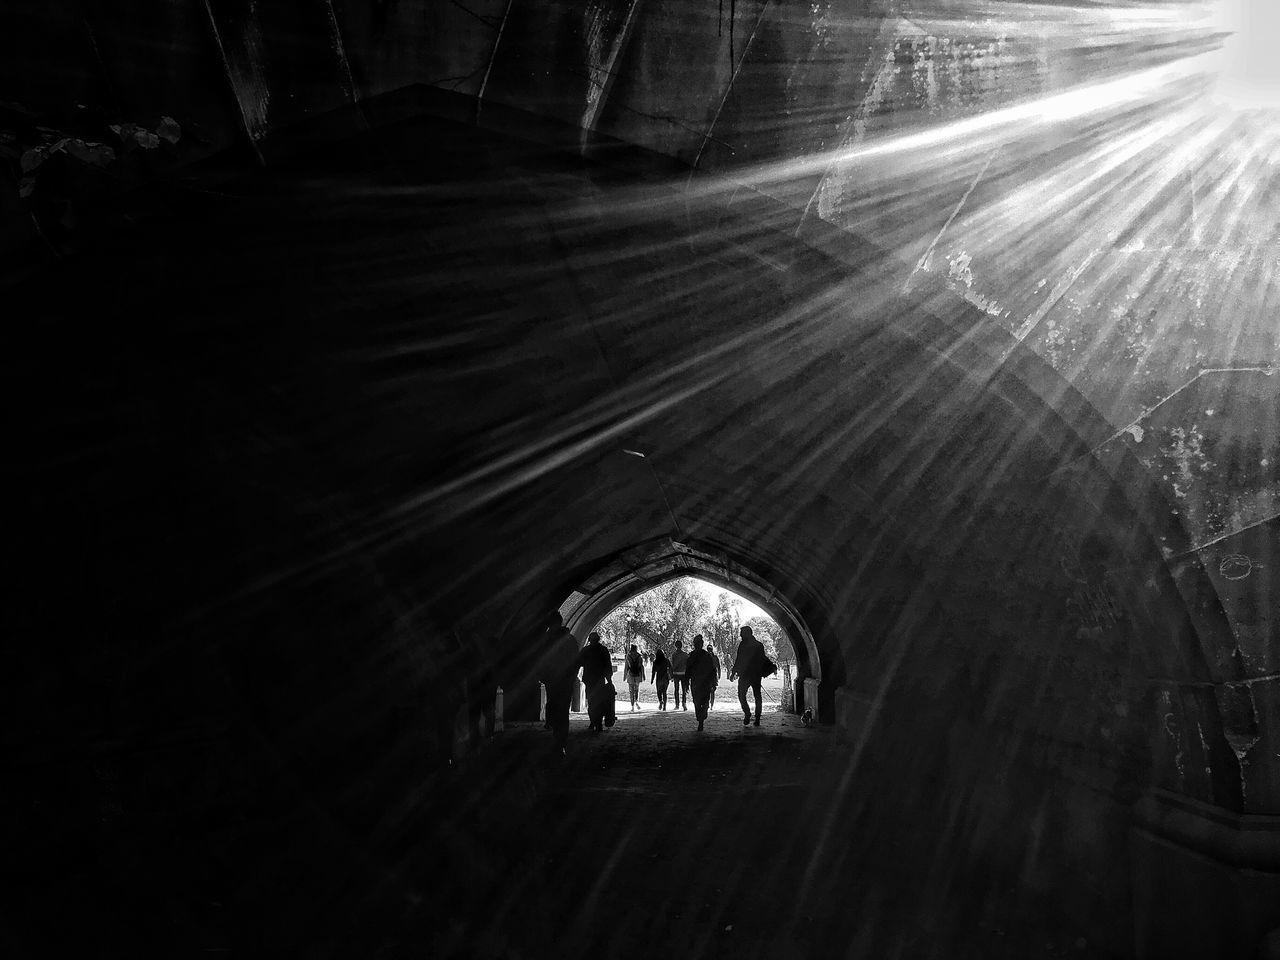 Sunlight Built Structure Monochrome Photography Architecture Real People Men Sunbeam Arch Prospect Park Blackandwhite Black & White Black And White Tunnel ProspectPark